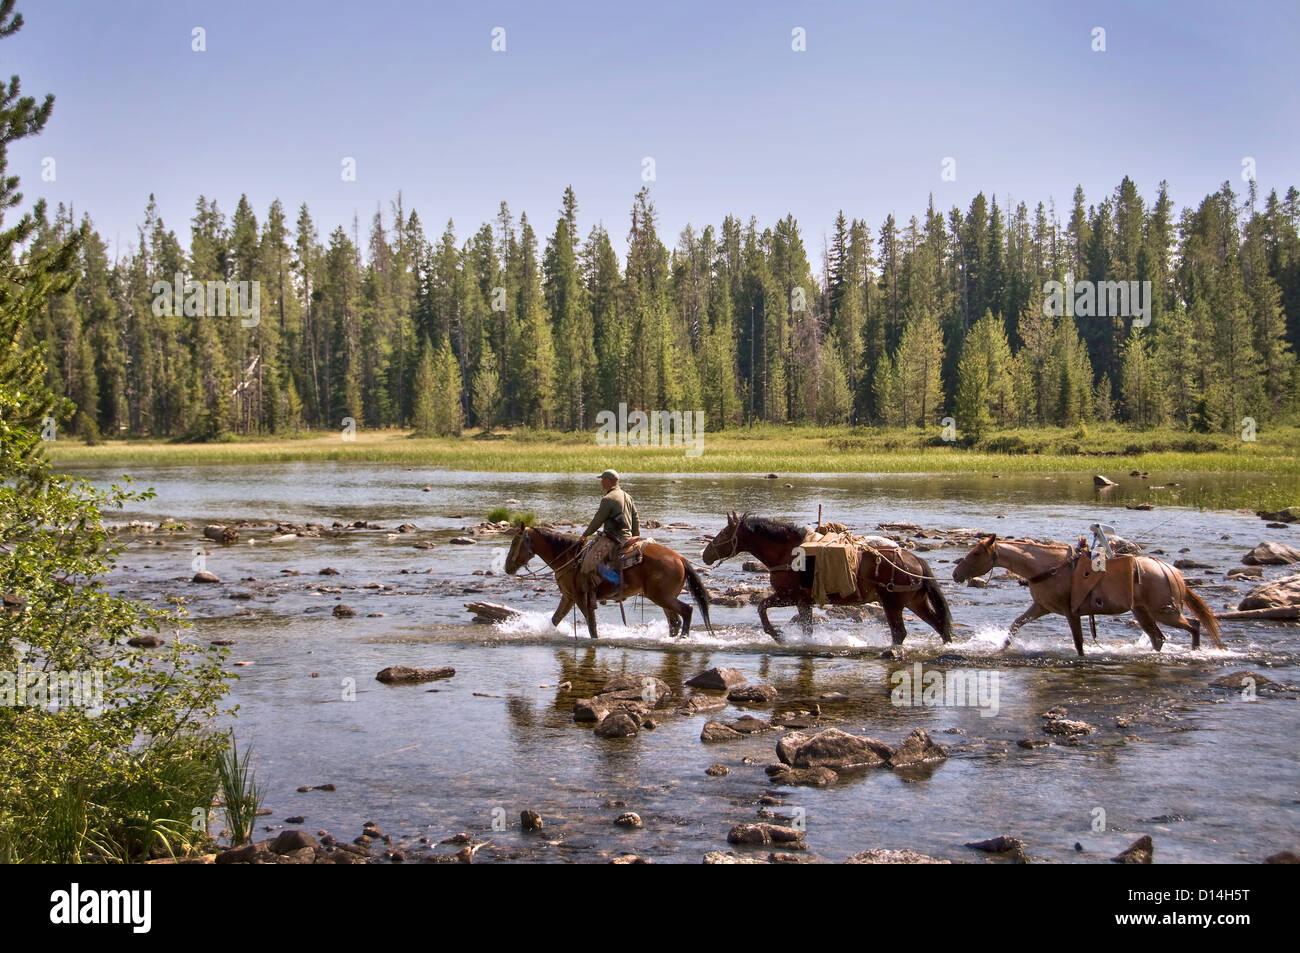 Three horses crossing String Lake - Grand Teton National Park, Wyoming, USA Stock Photo